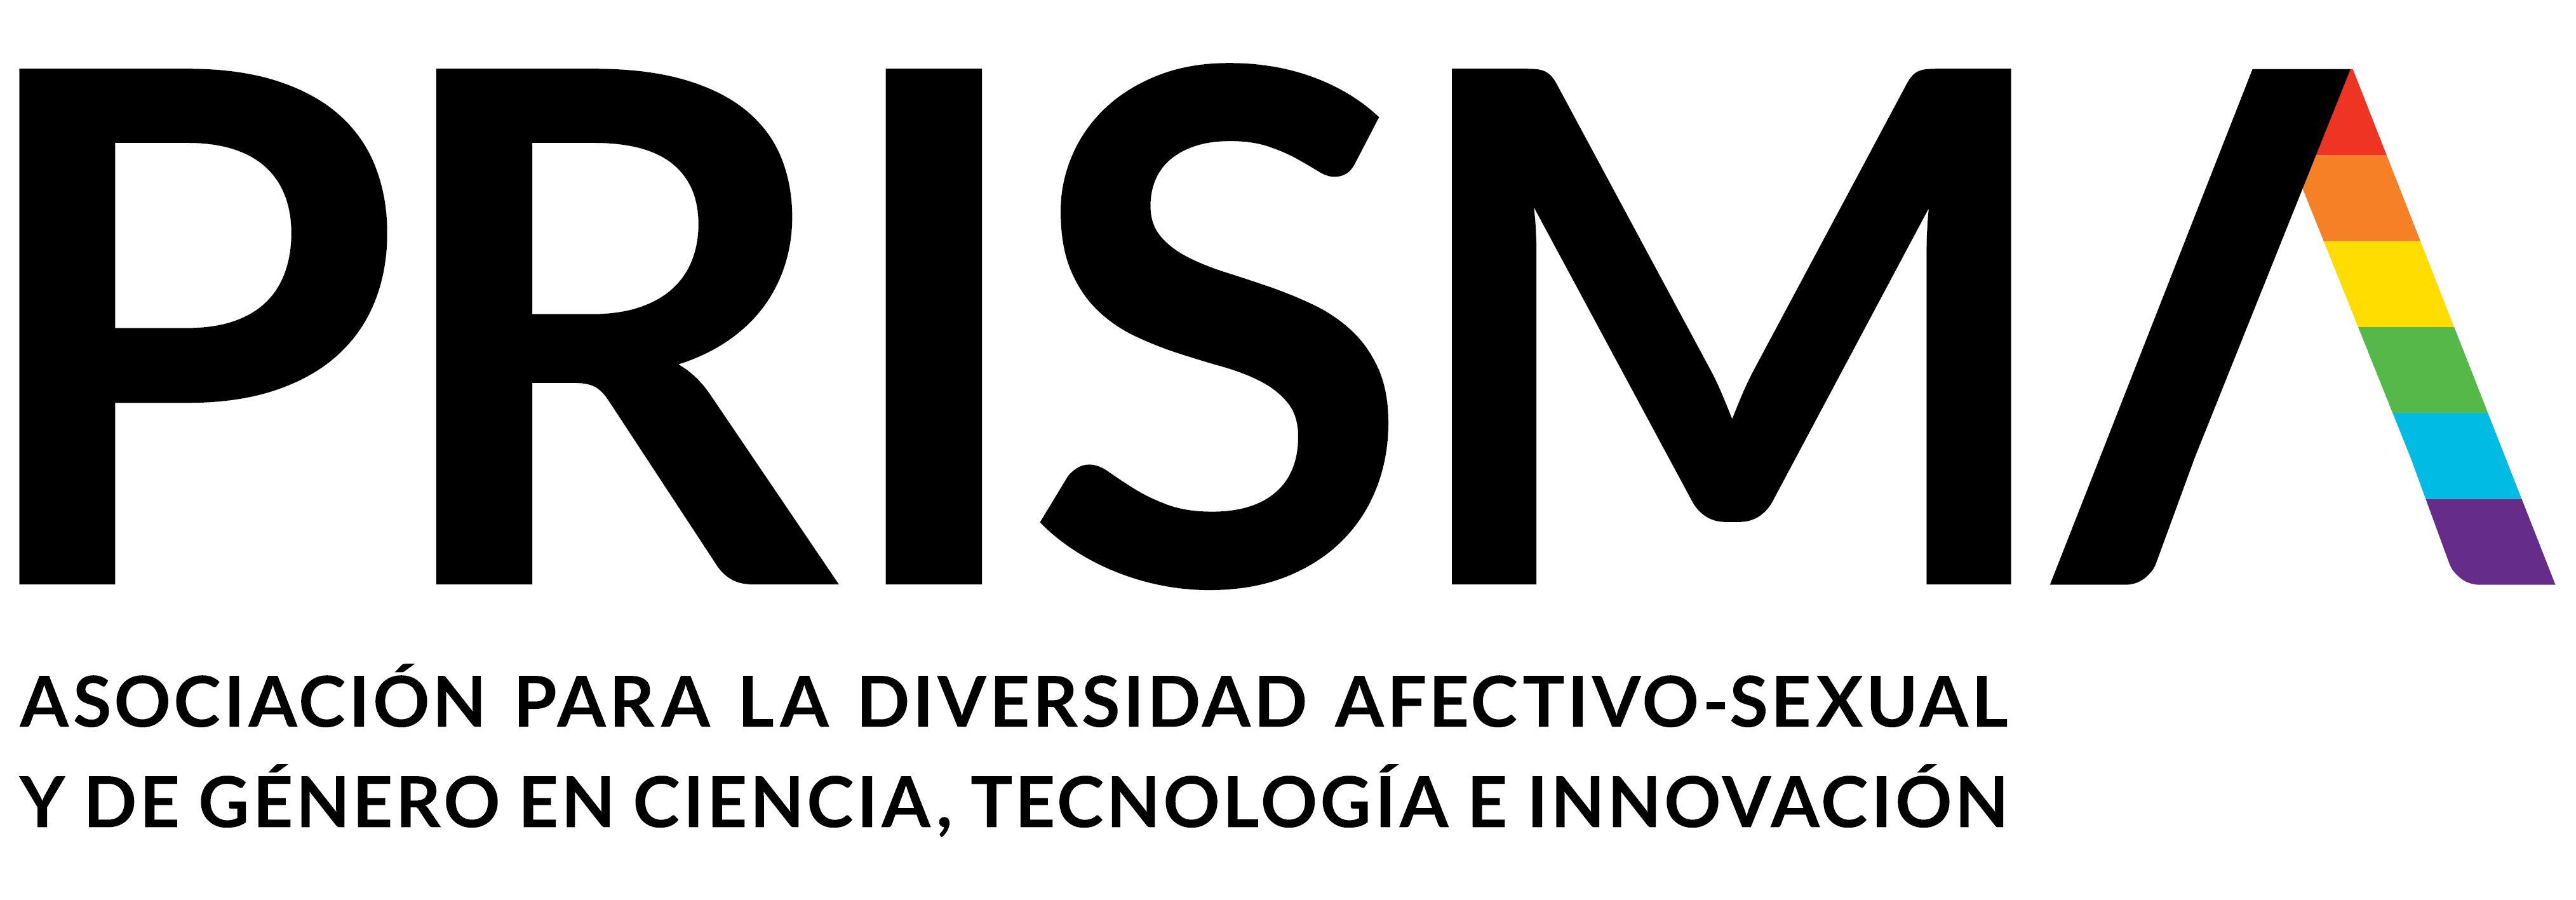 Prisma, LGTBIQA+ en STEM